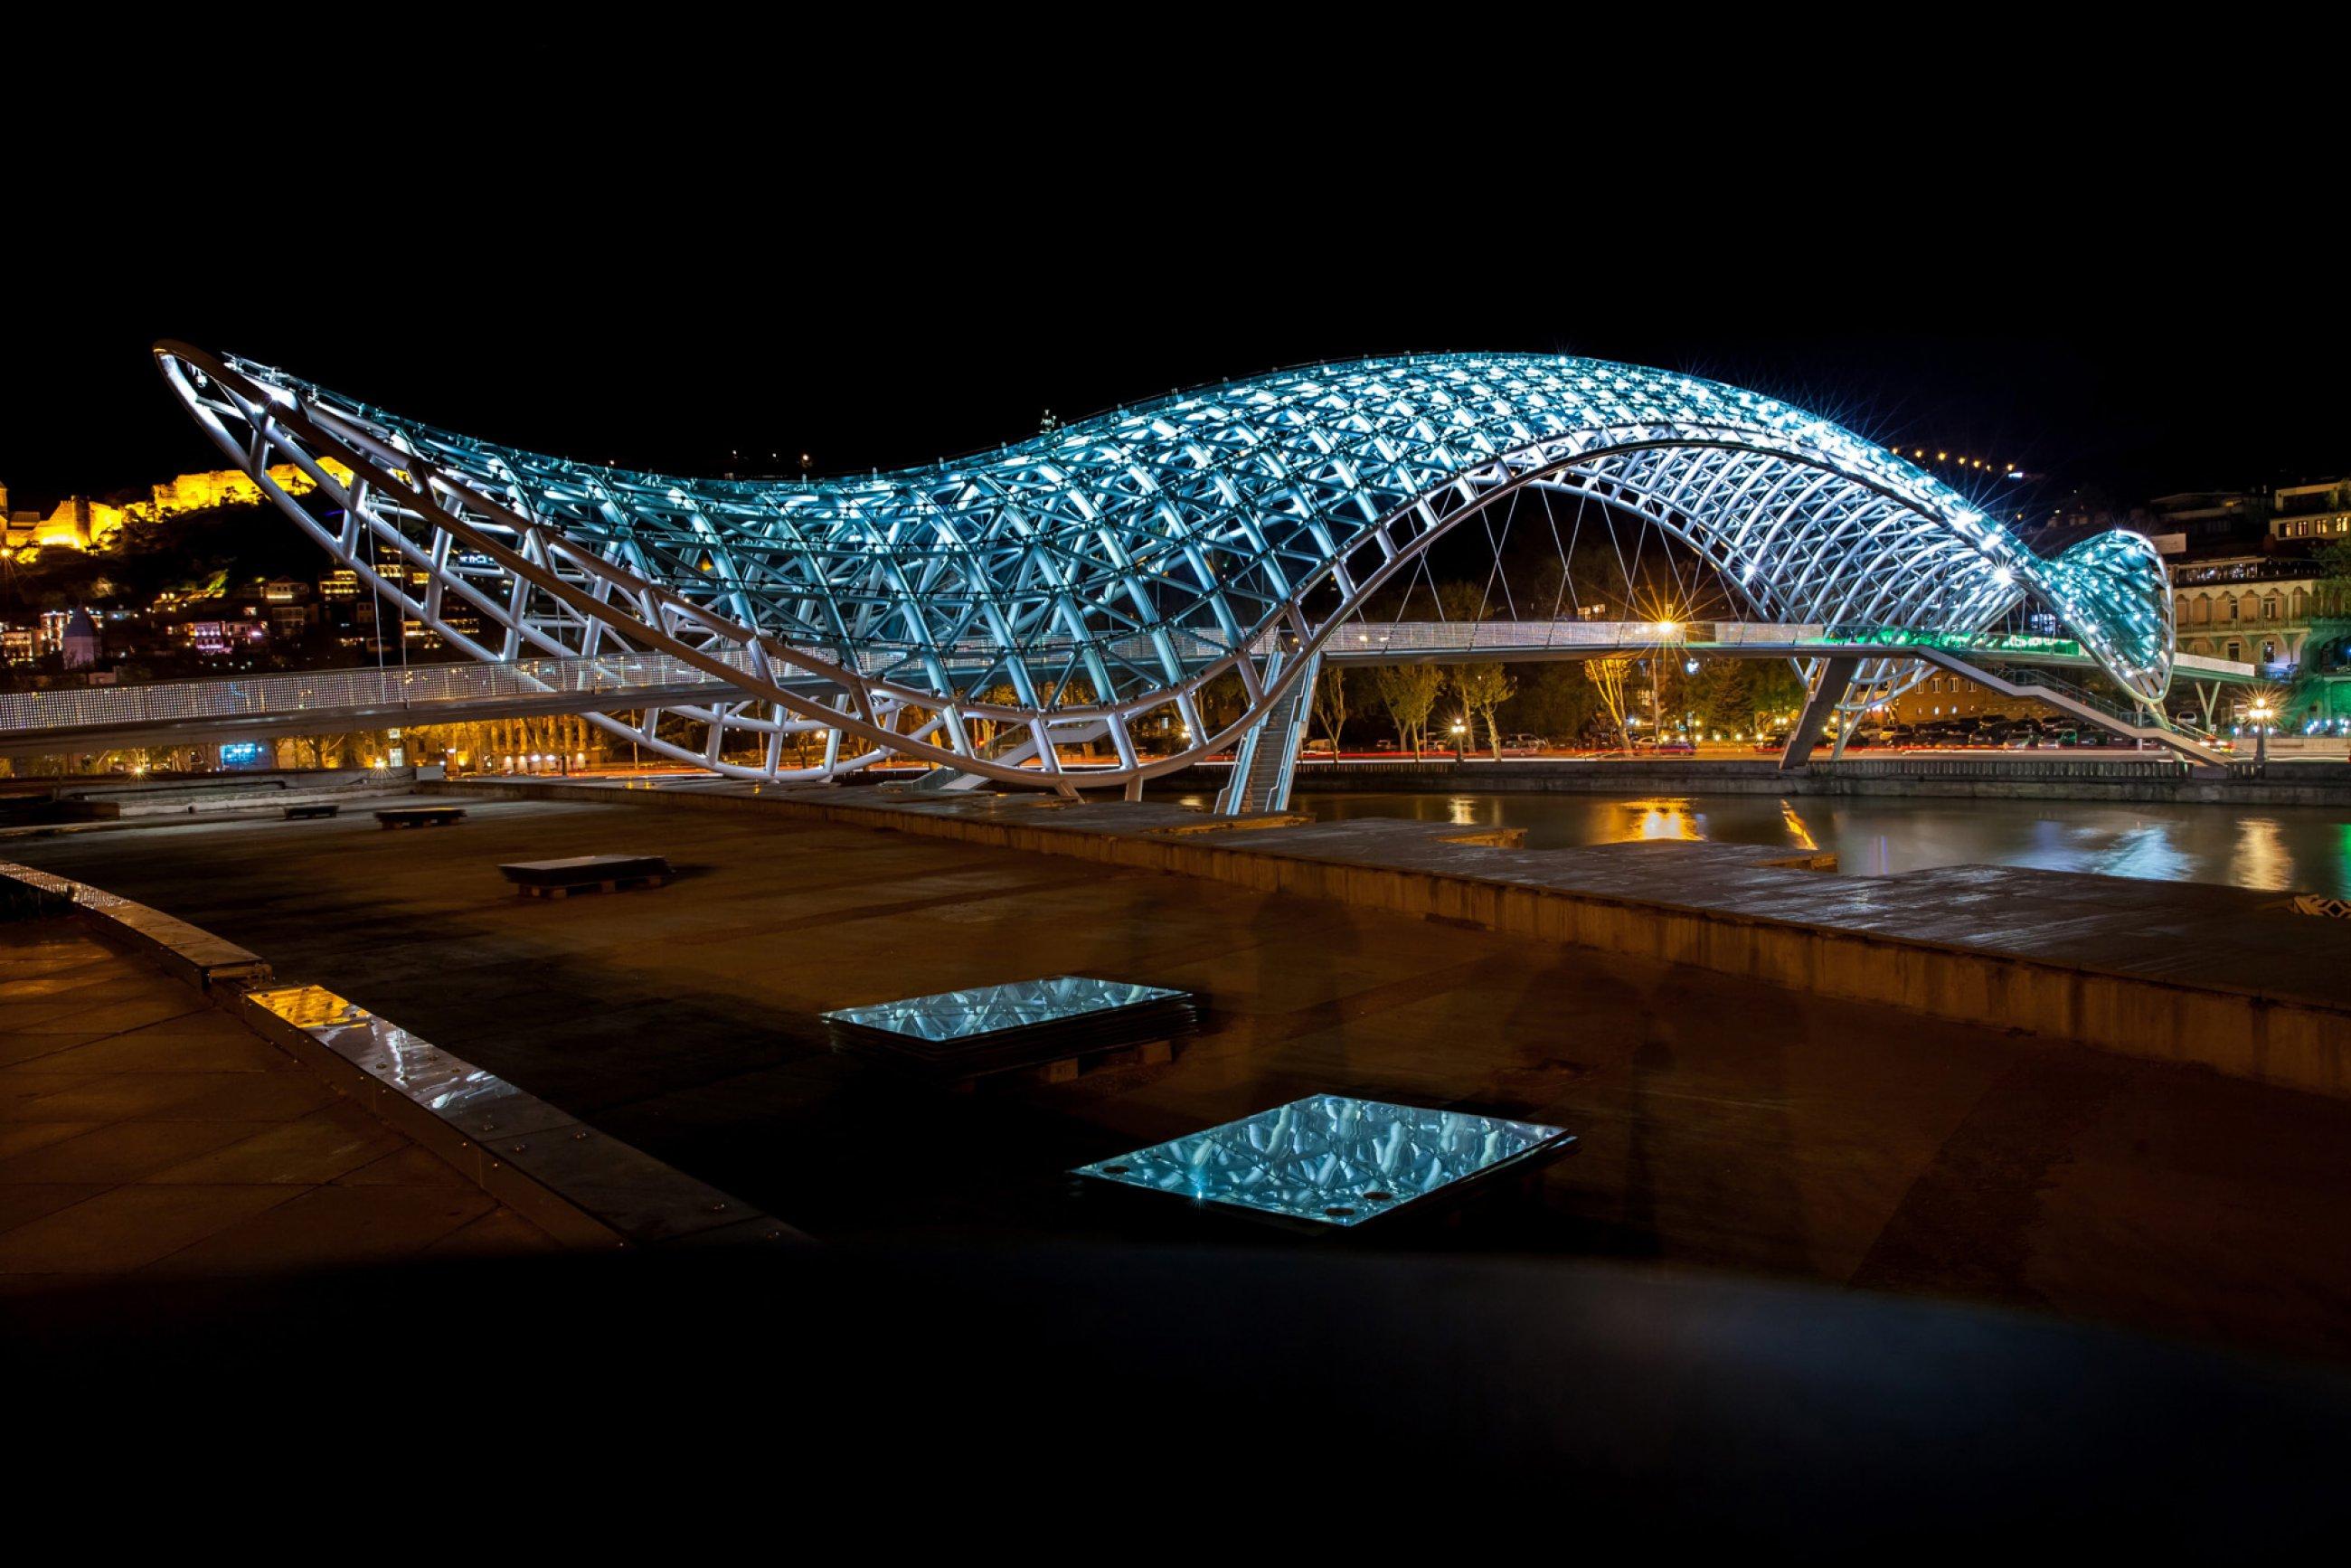 https://bubo.sk/uploads/galleries/4940/tbilisi-shutterstock-280828427-2-.jpg